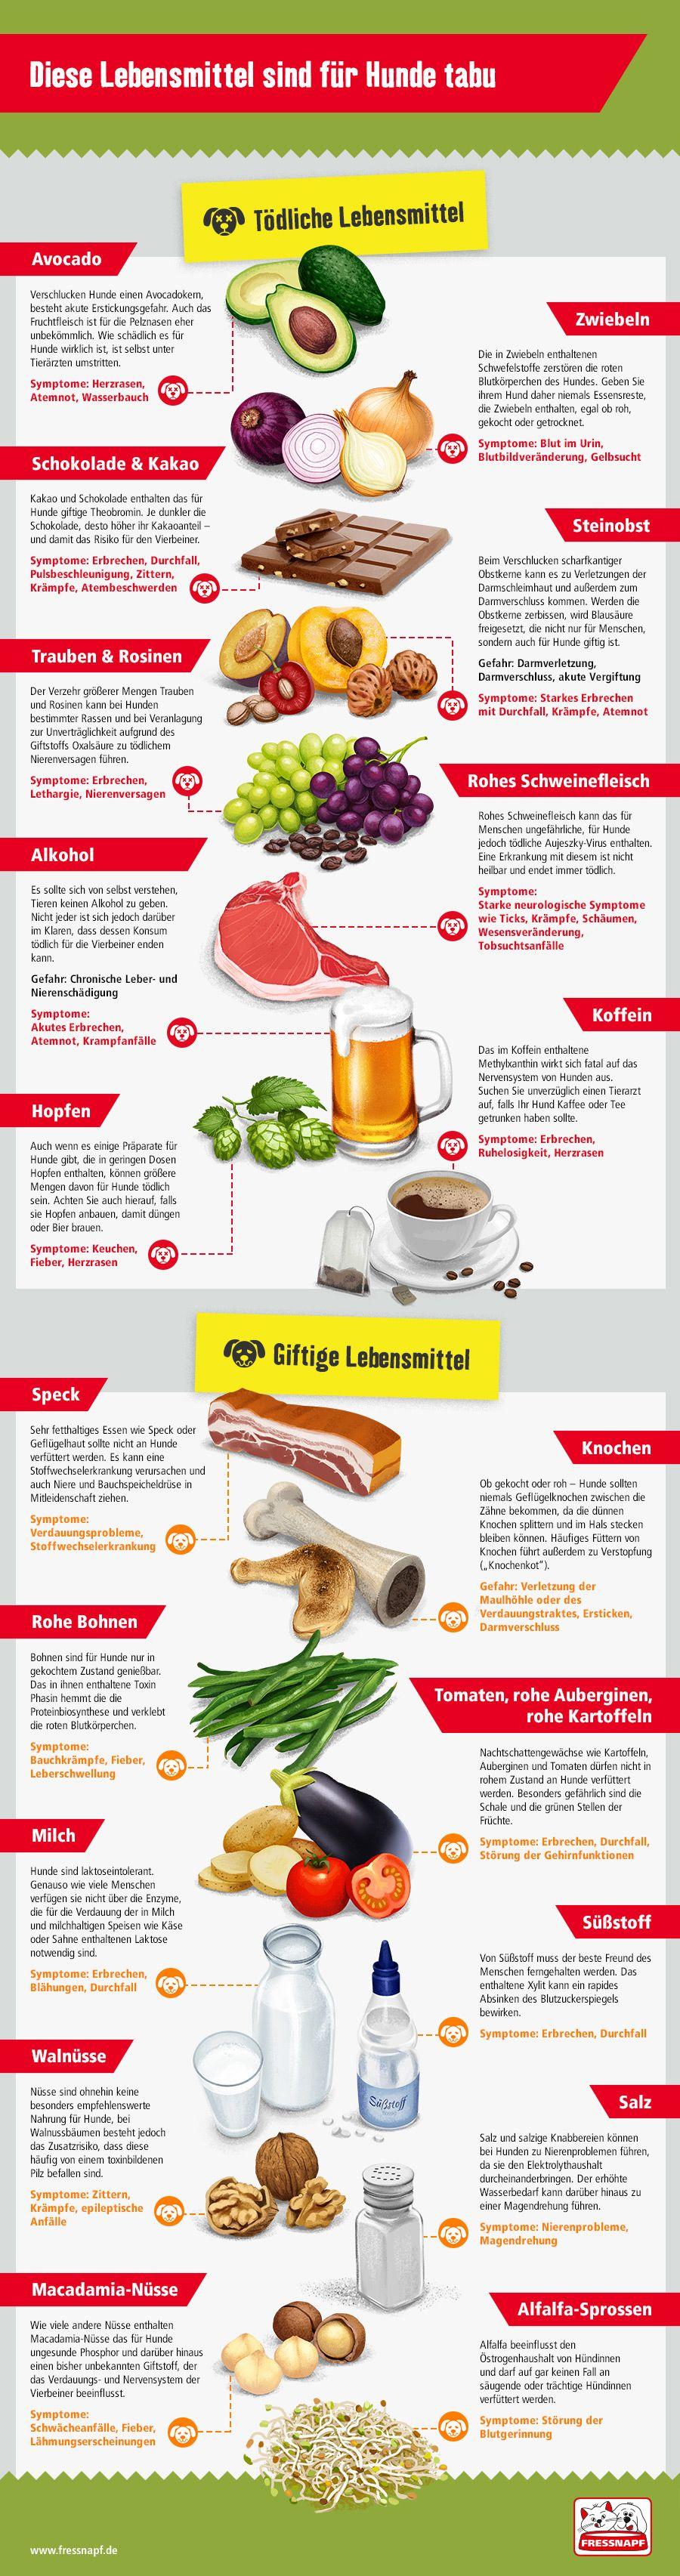 Giftige Lebensmittel Fur Hunde Fressnapf Deutschland Giftige